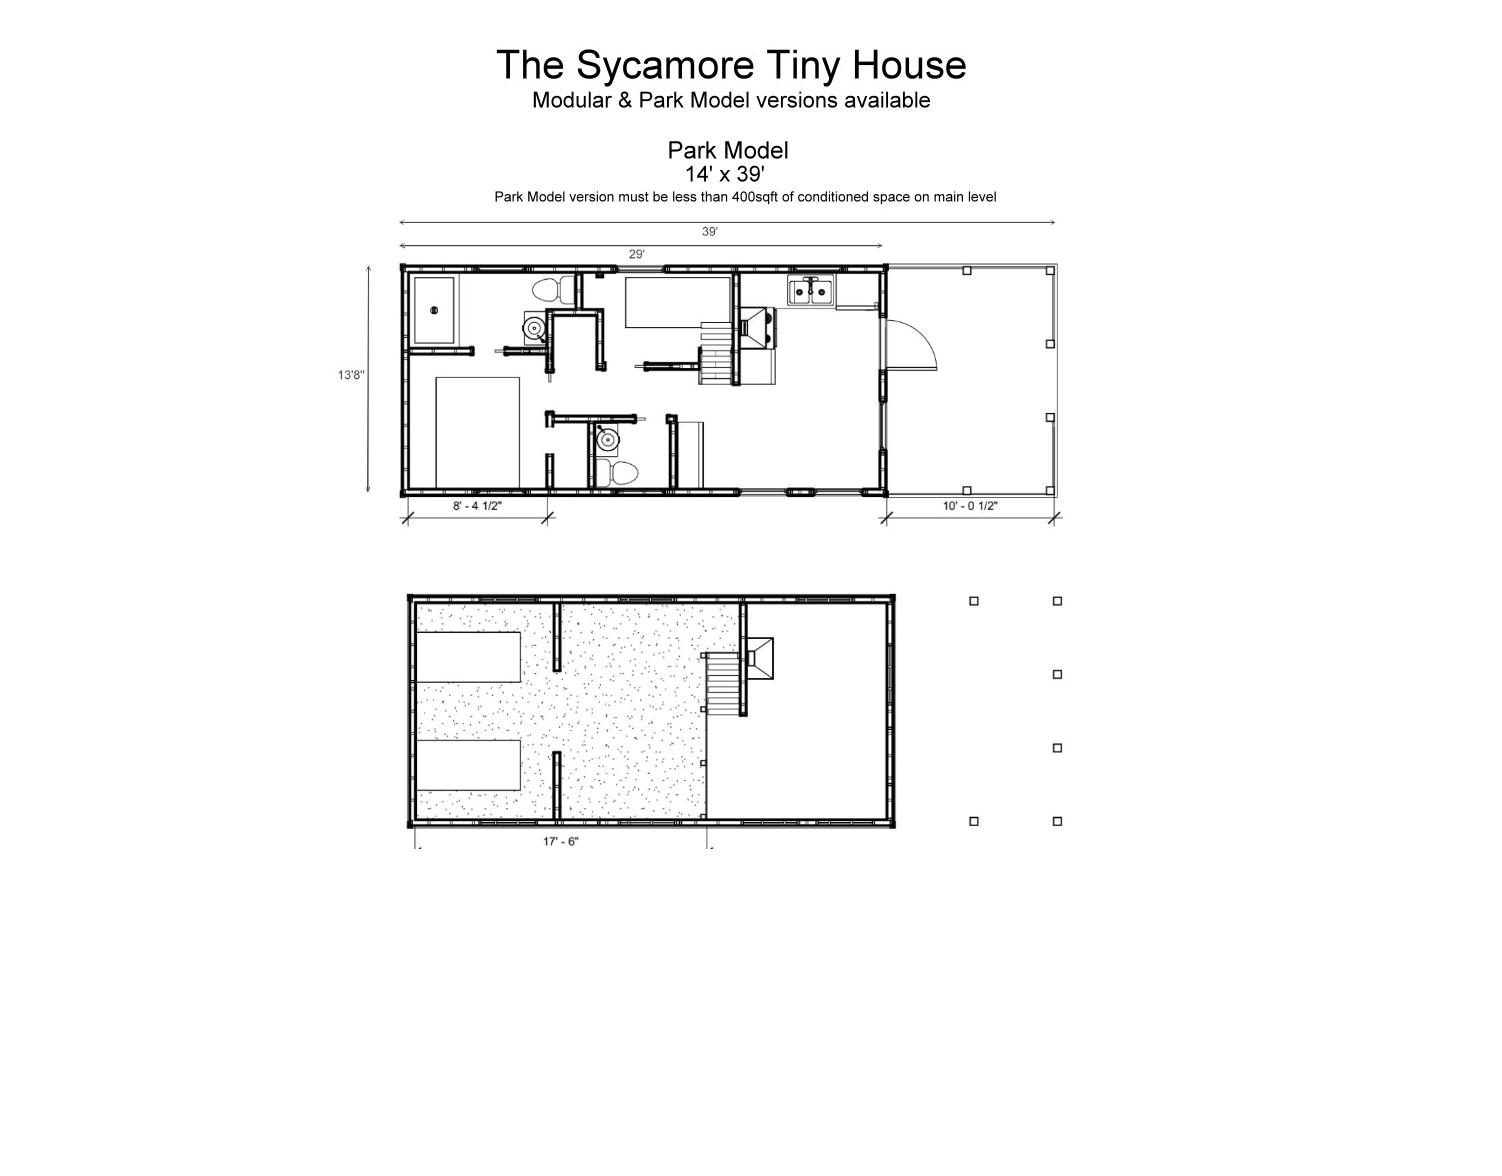 The Sycamore Park Model Tiny House - Floor Plan